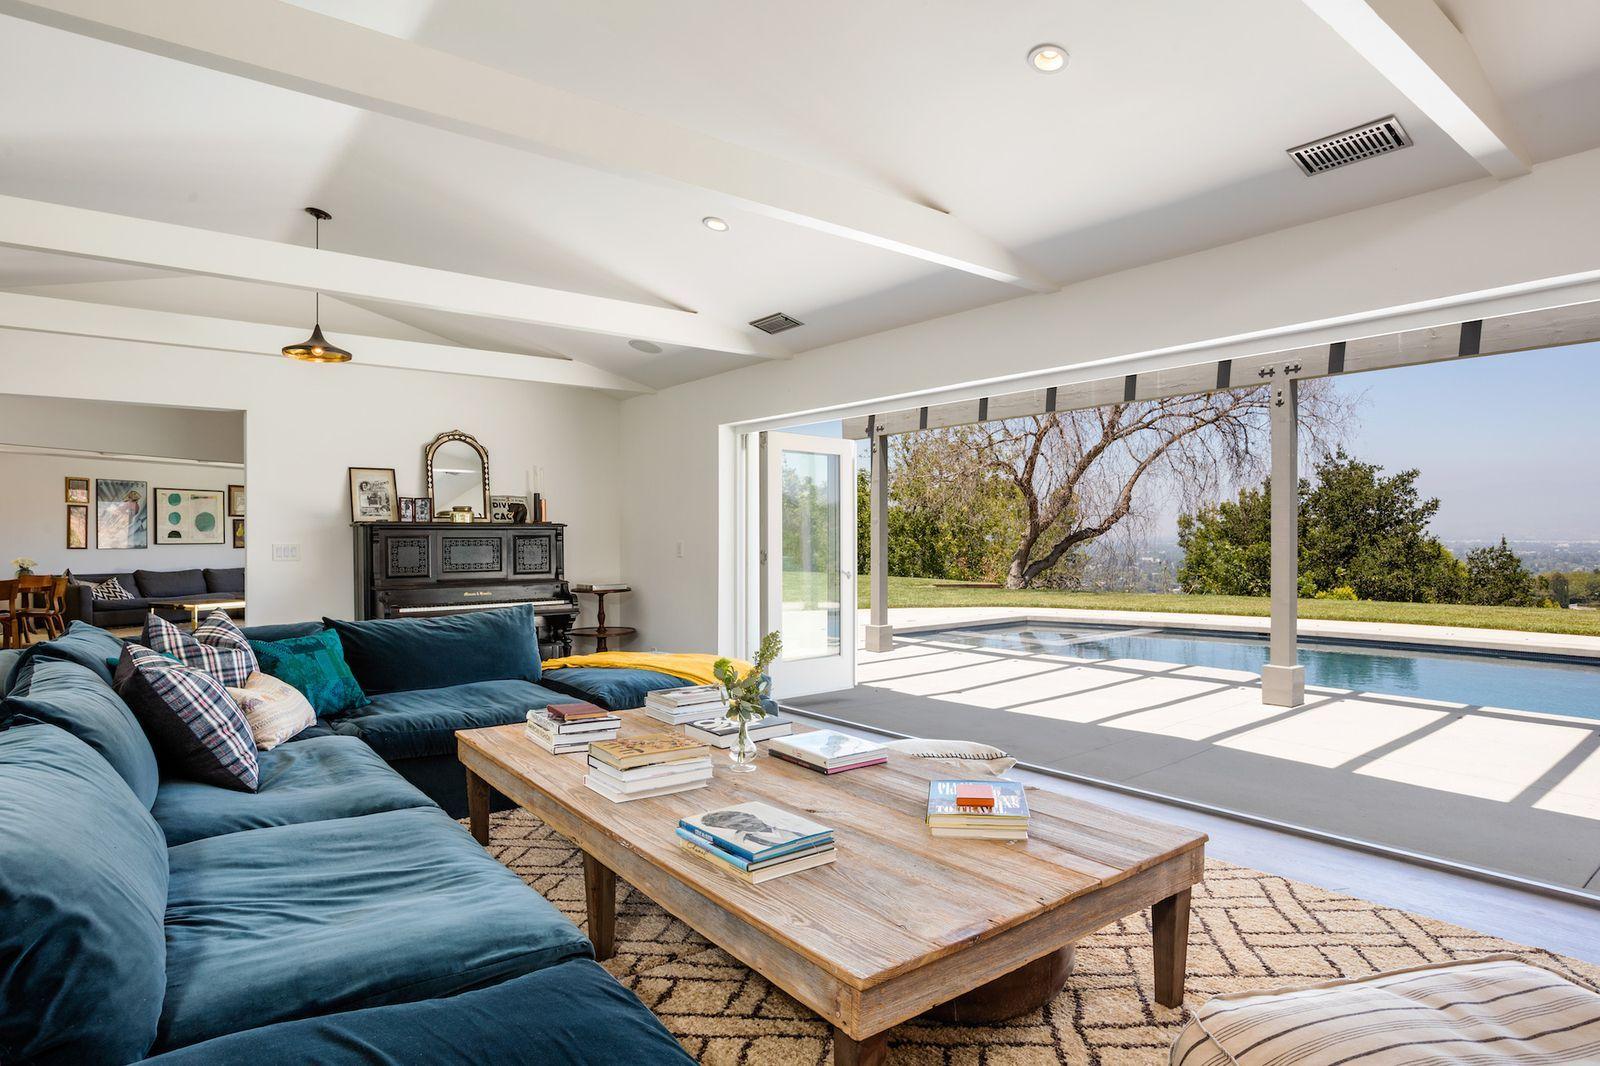 Rachel Bilson And Hayden Christensen Have Sold Their Hidden San Fernando Valley Home Home Home Decor Rachel Bilson